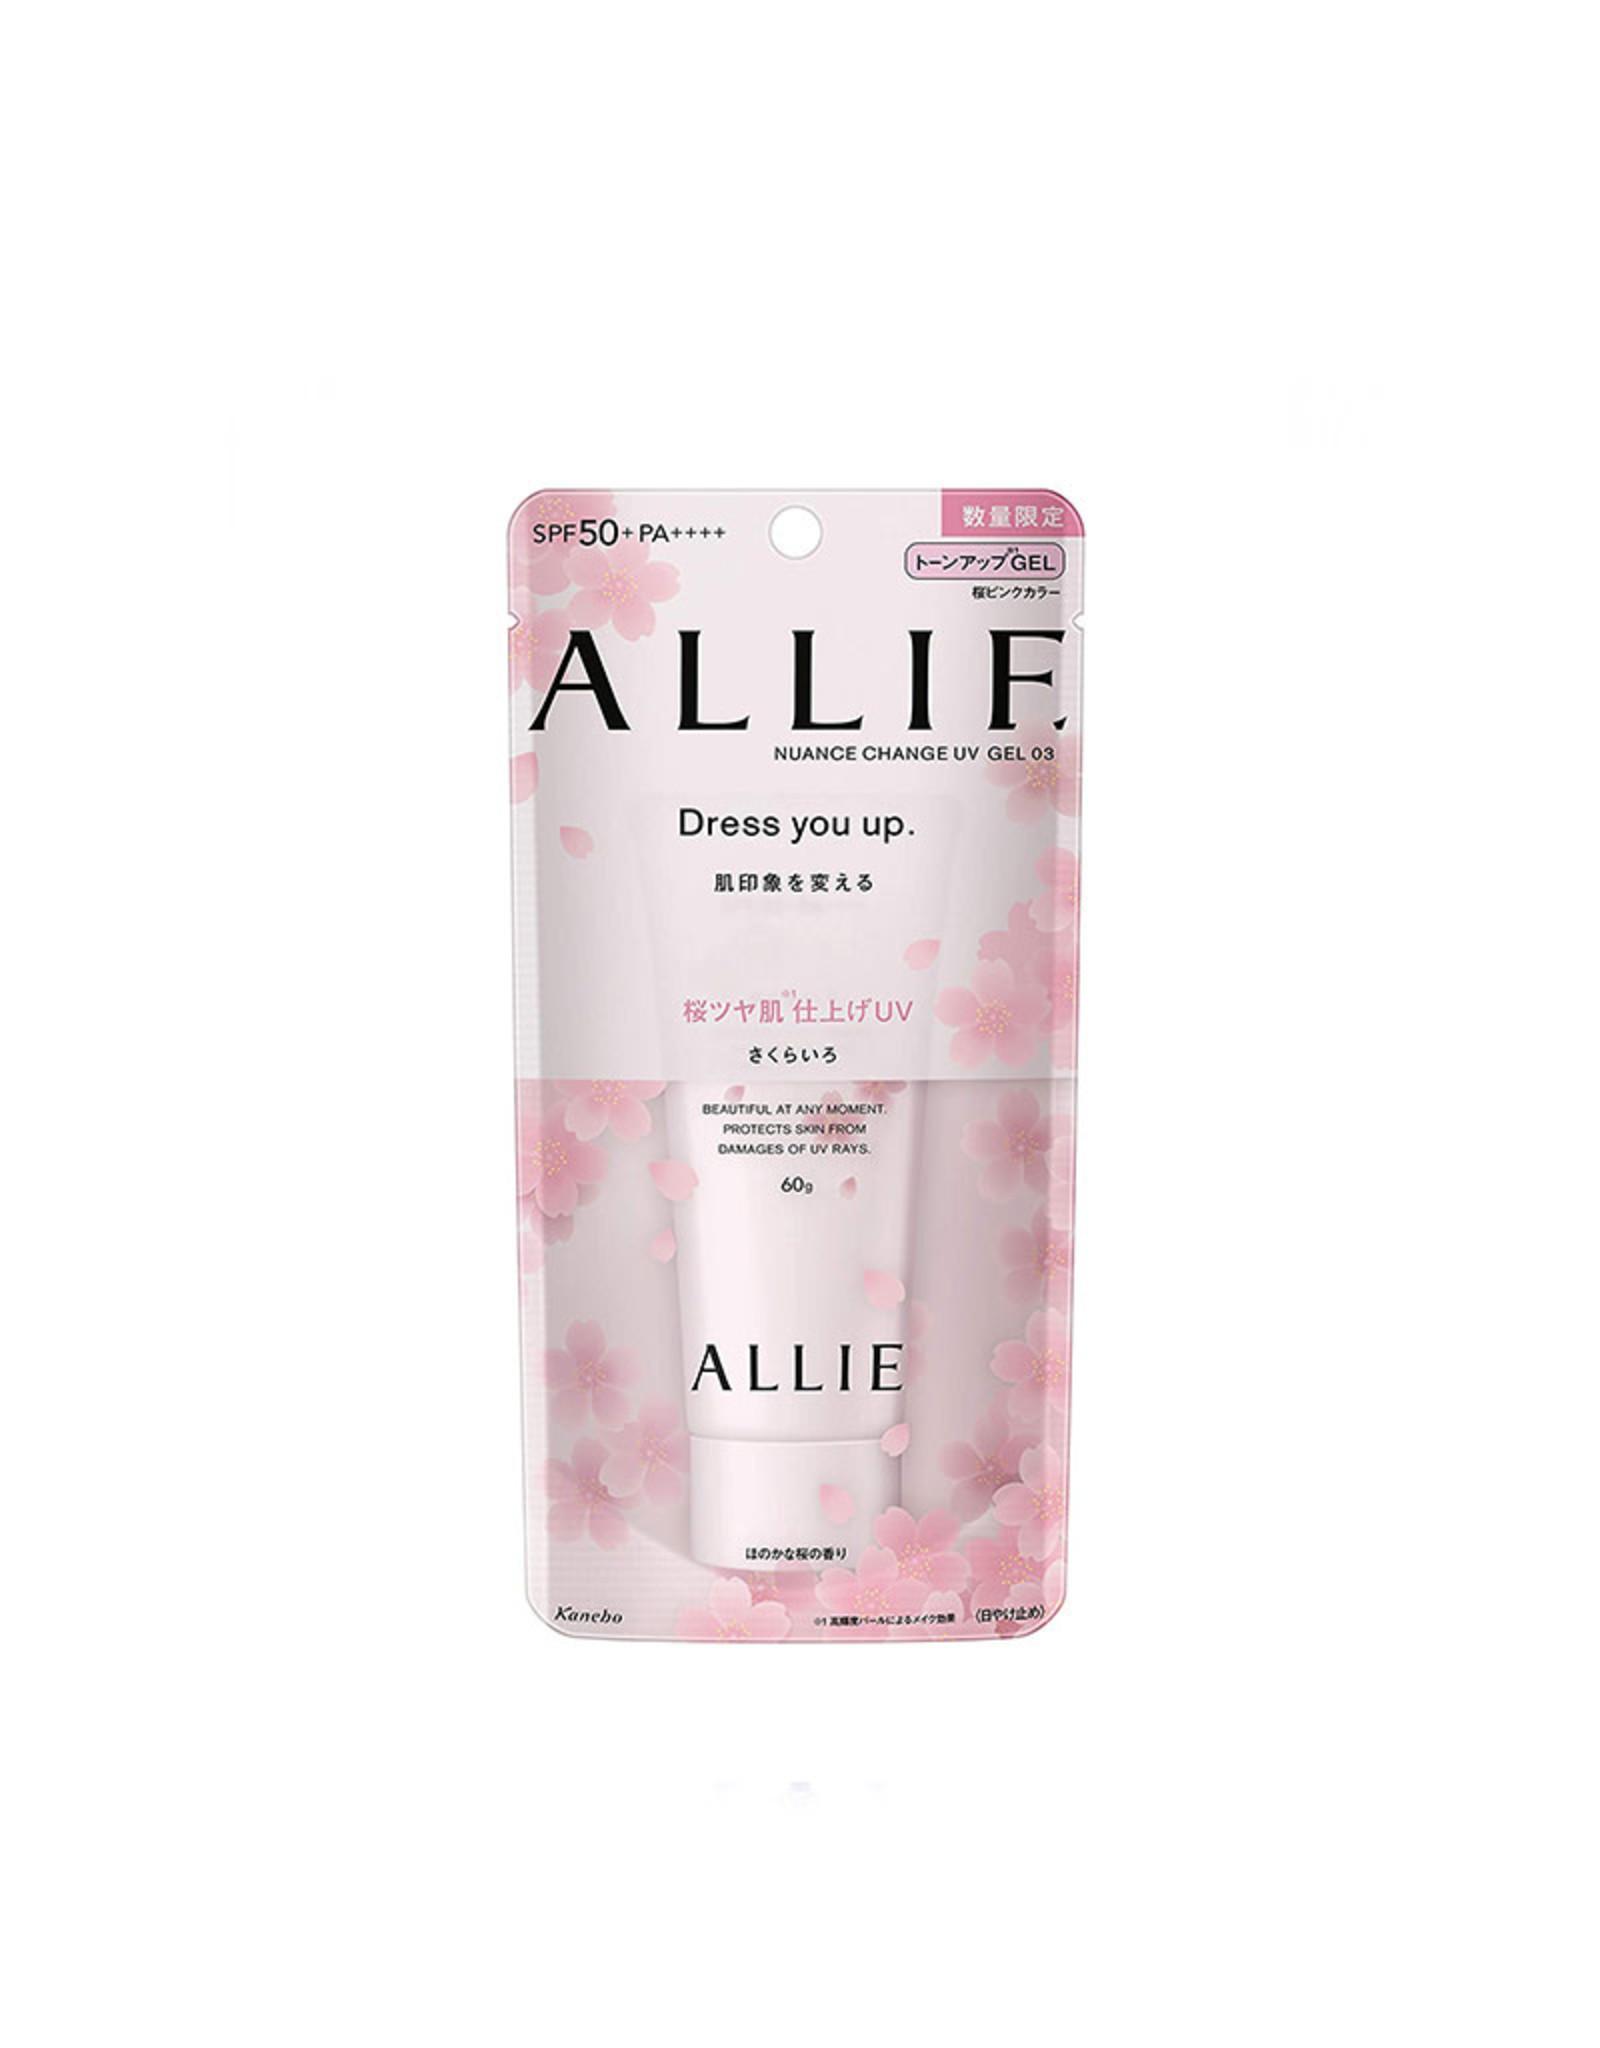 Kanebo Allie Nuance Change Gel Spf50+ PA++++Sakura Limited